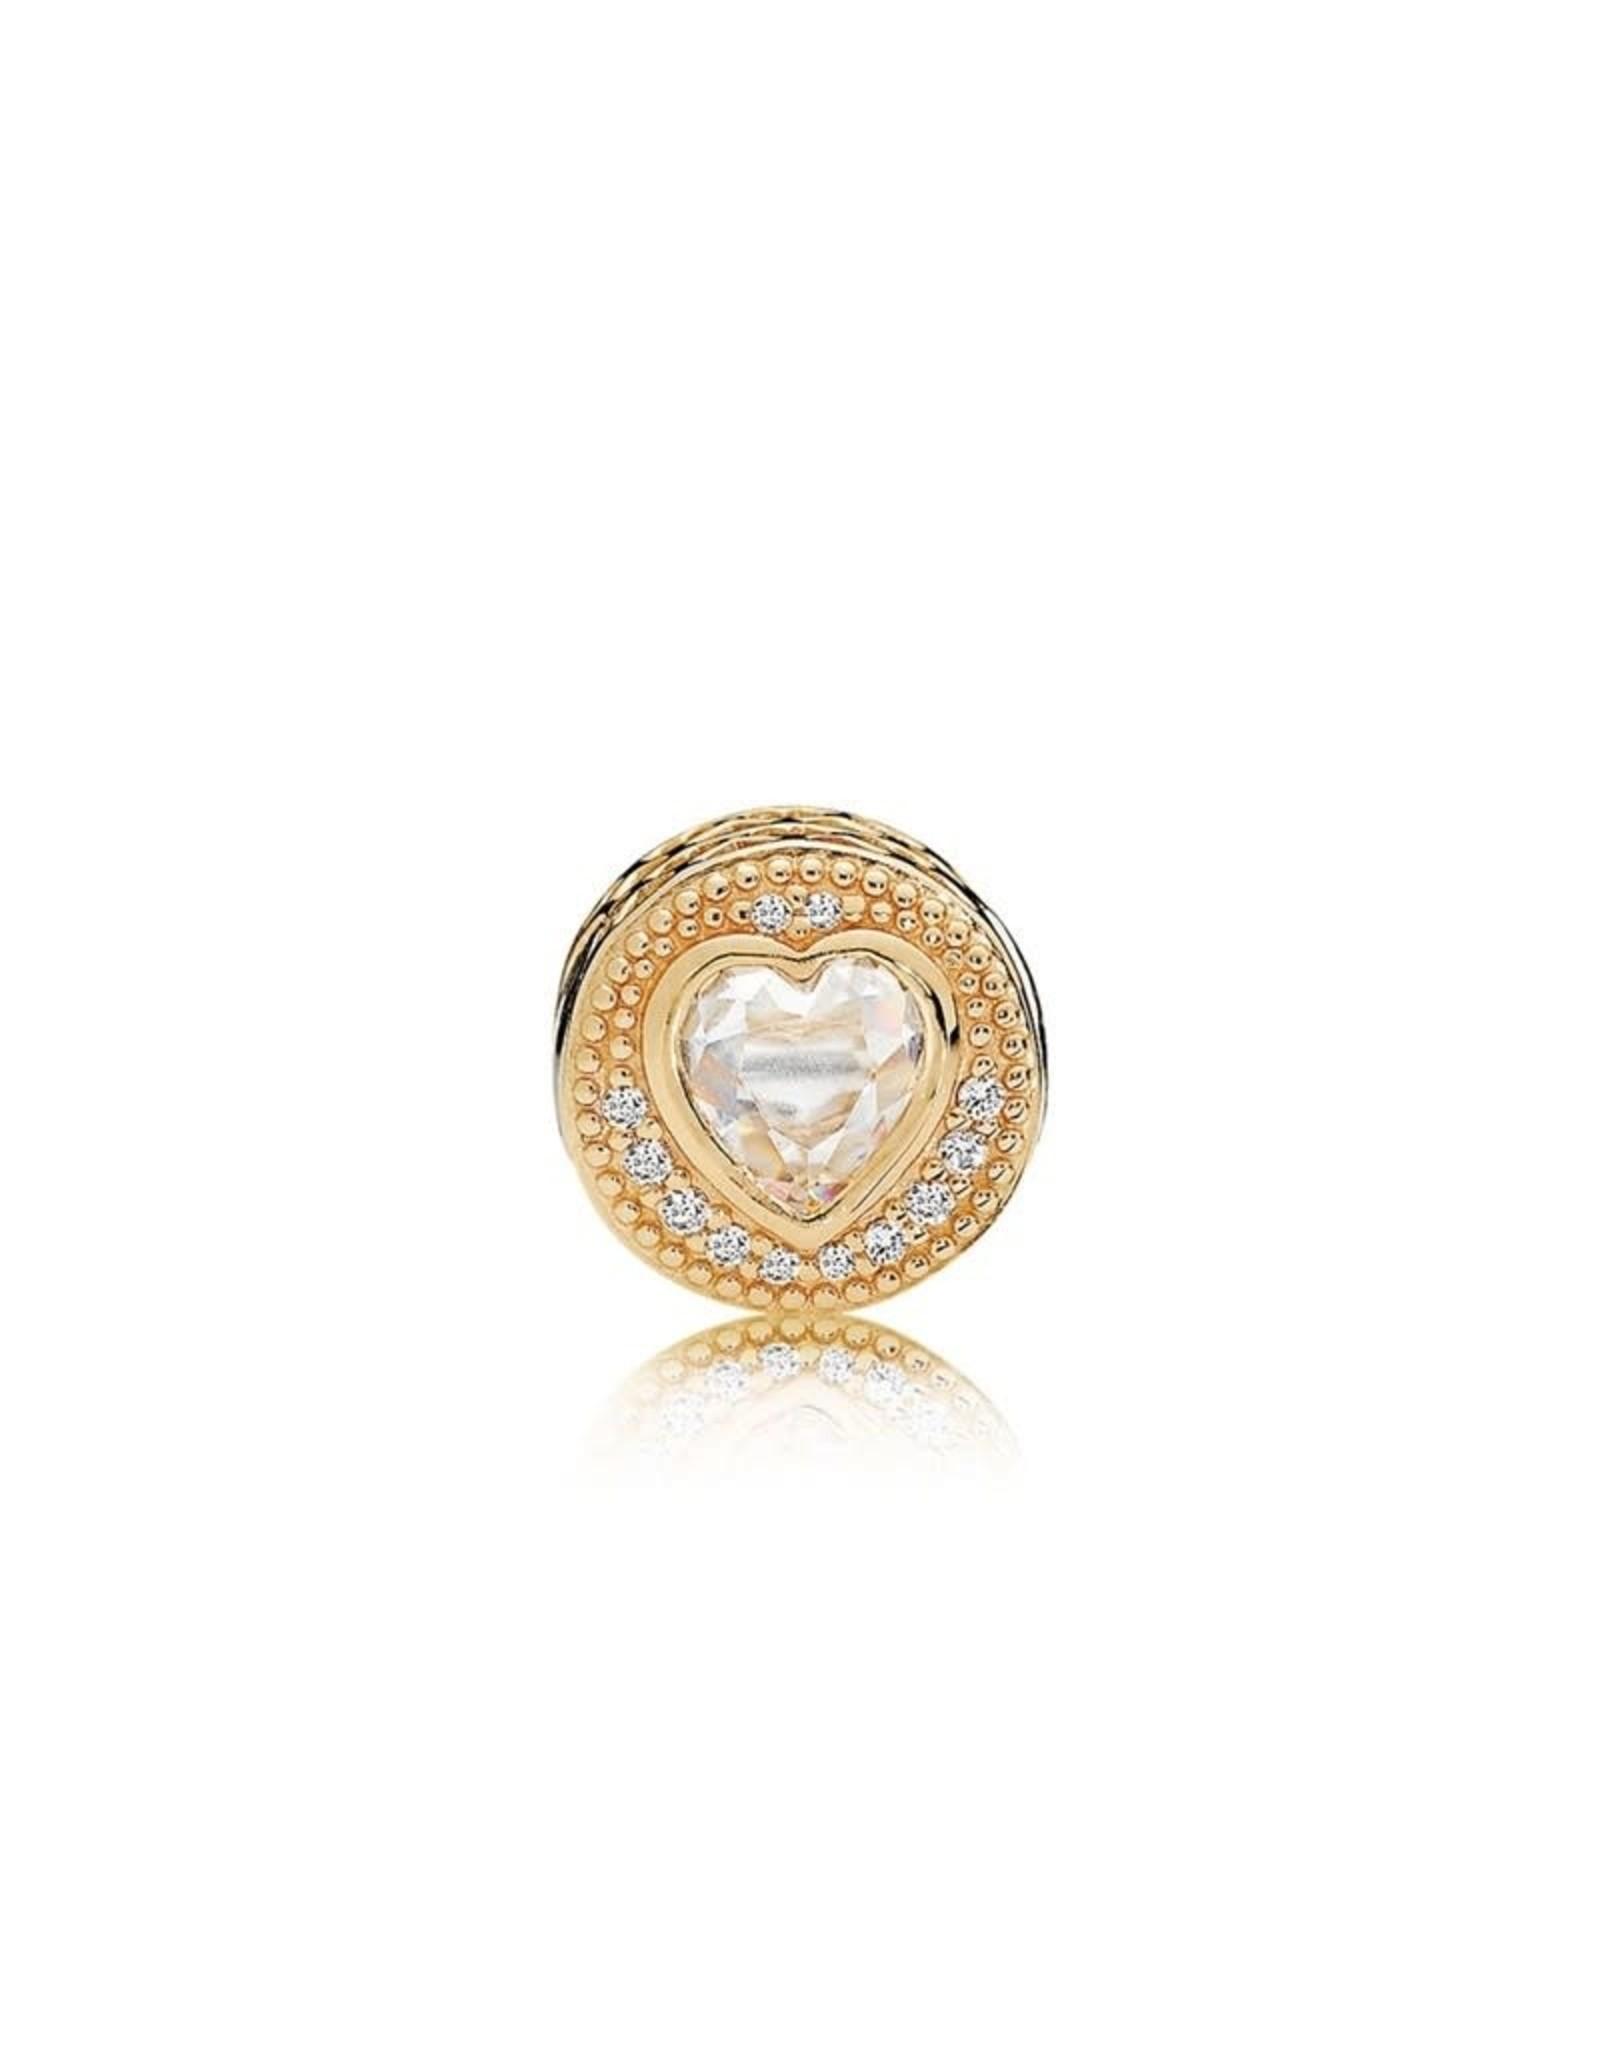 Pandora Pandora Essence Charm, 14K Gold, Heart,Clear CZ